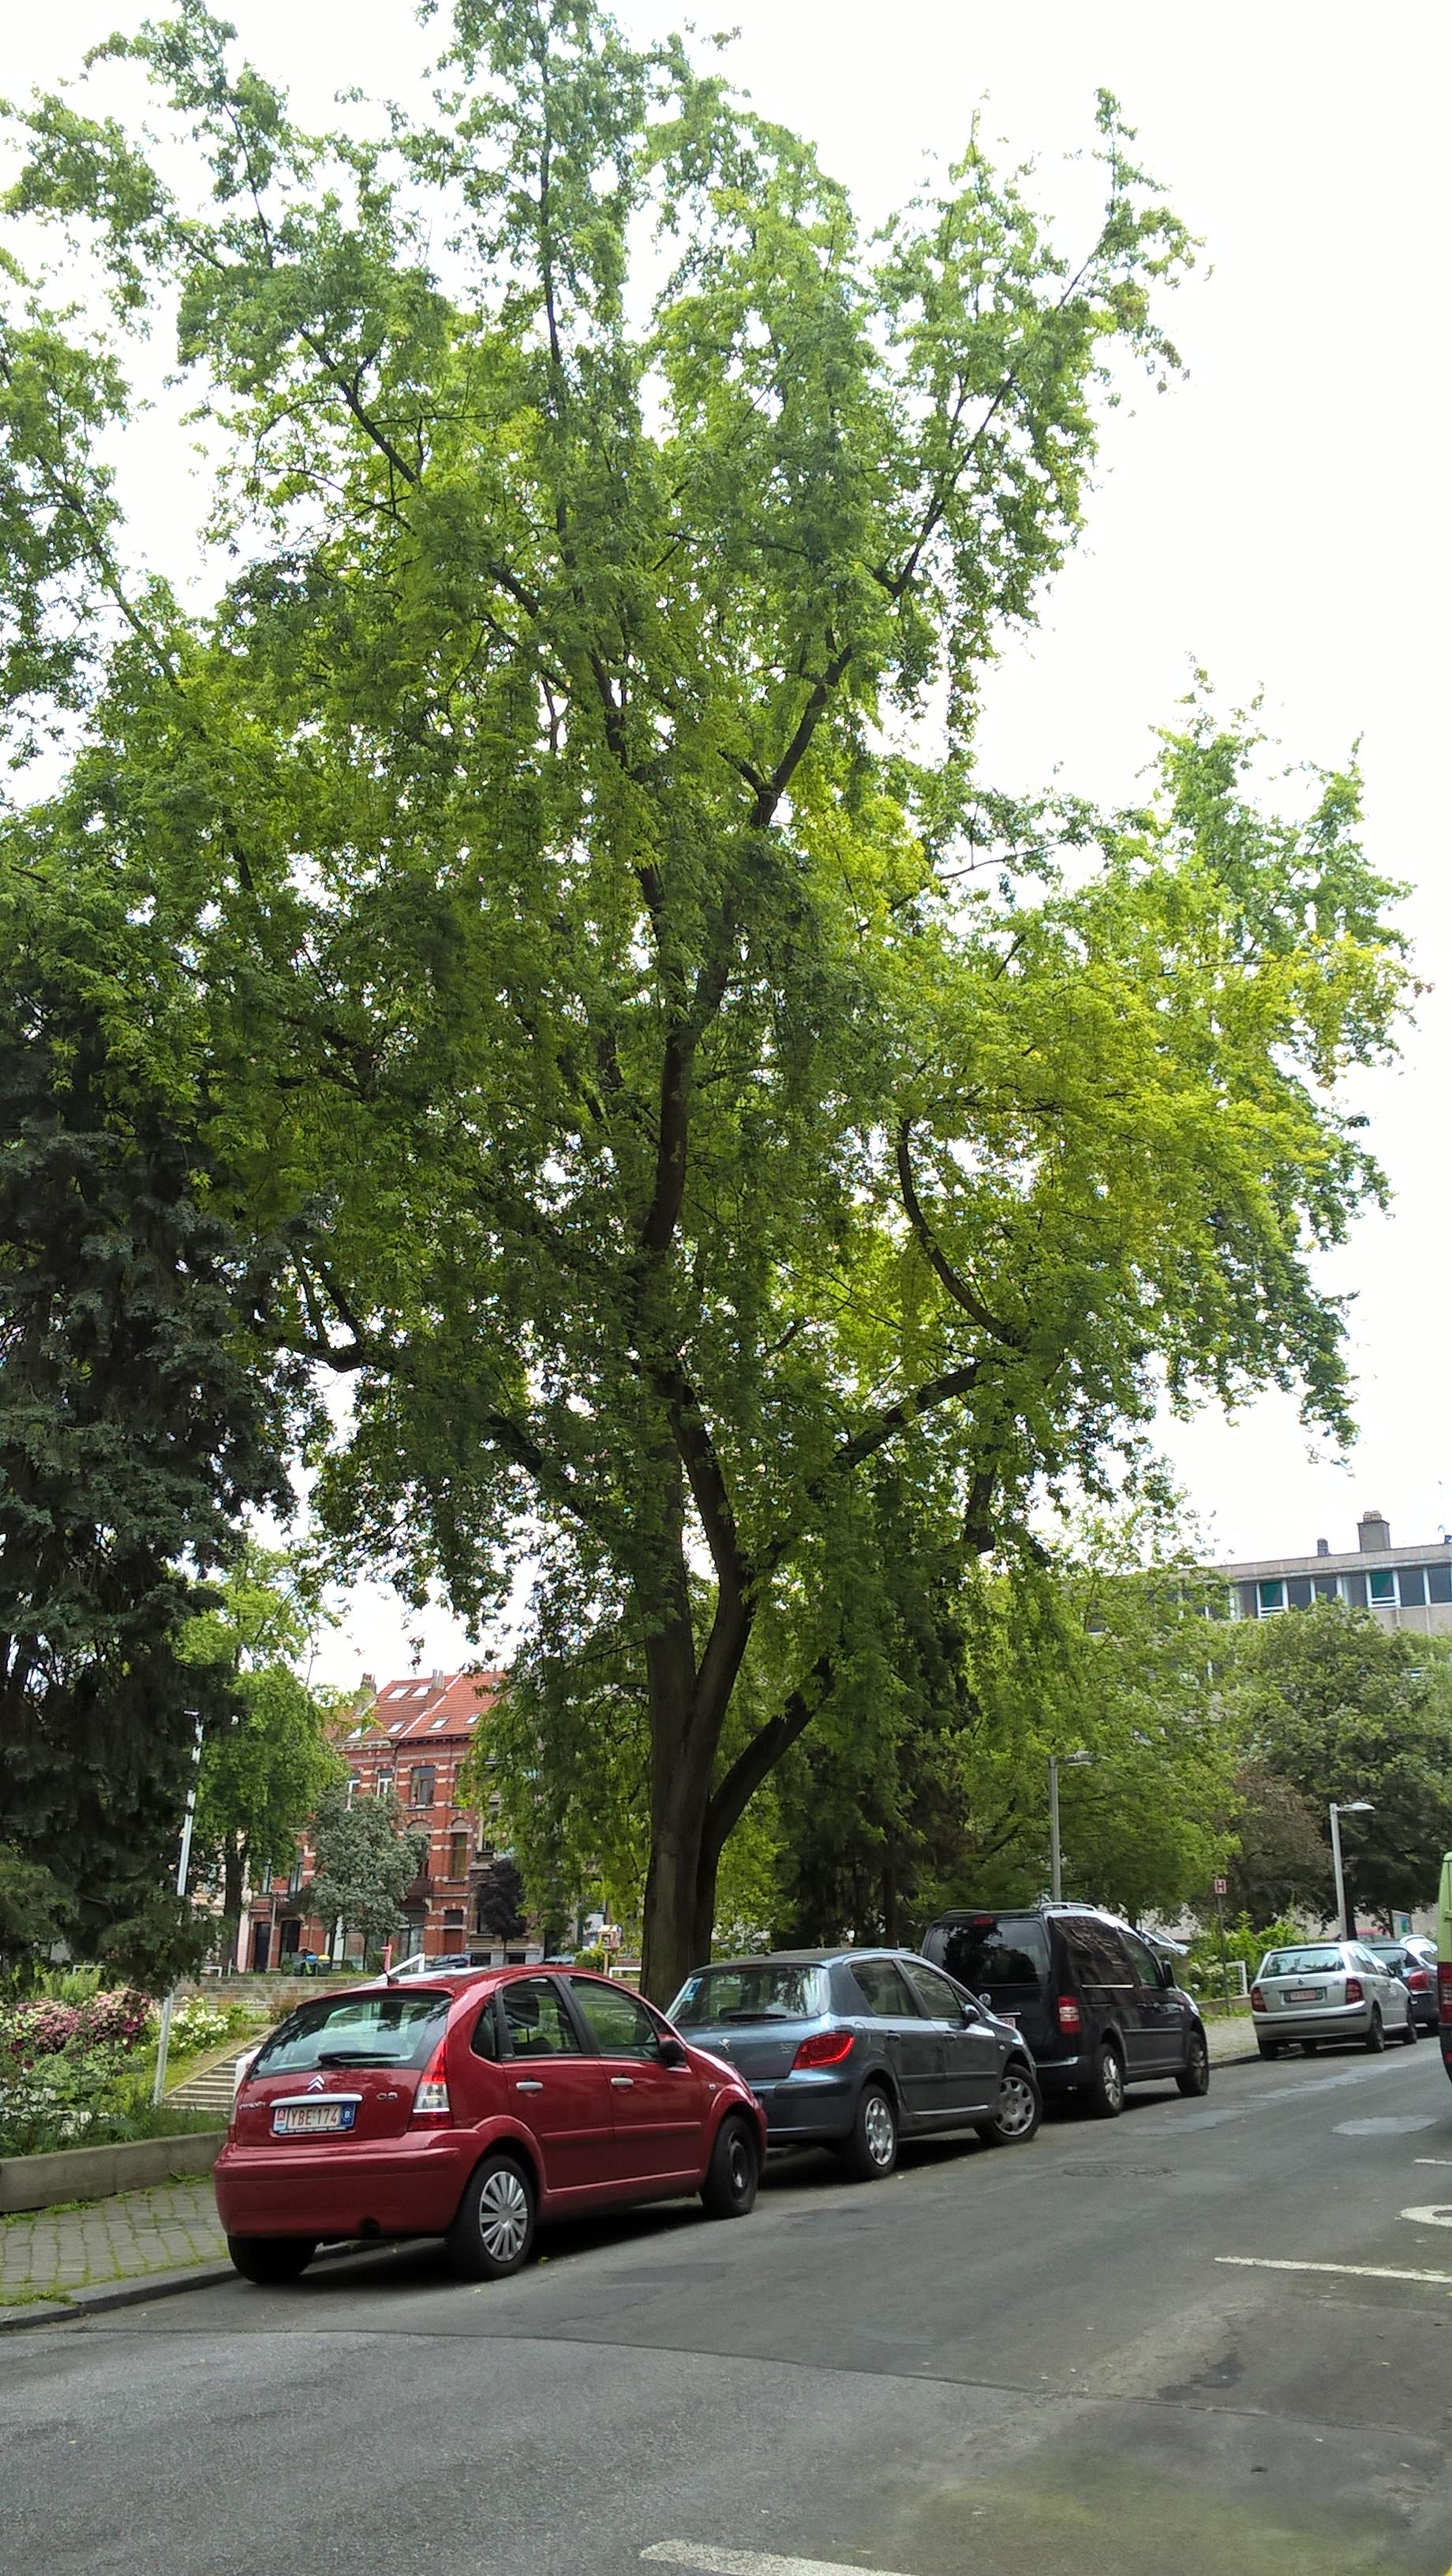 Acer saccharinum var. laciniatum,